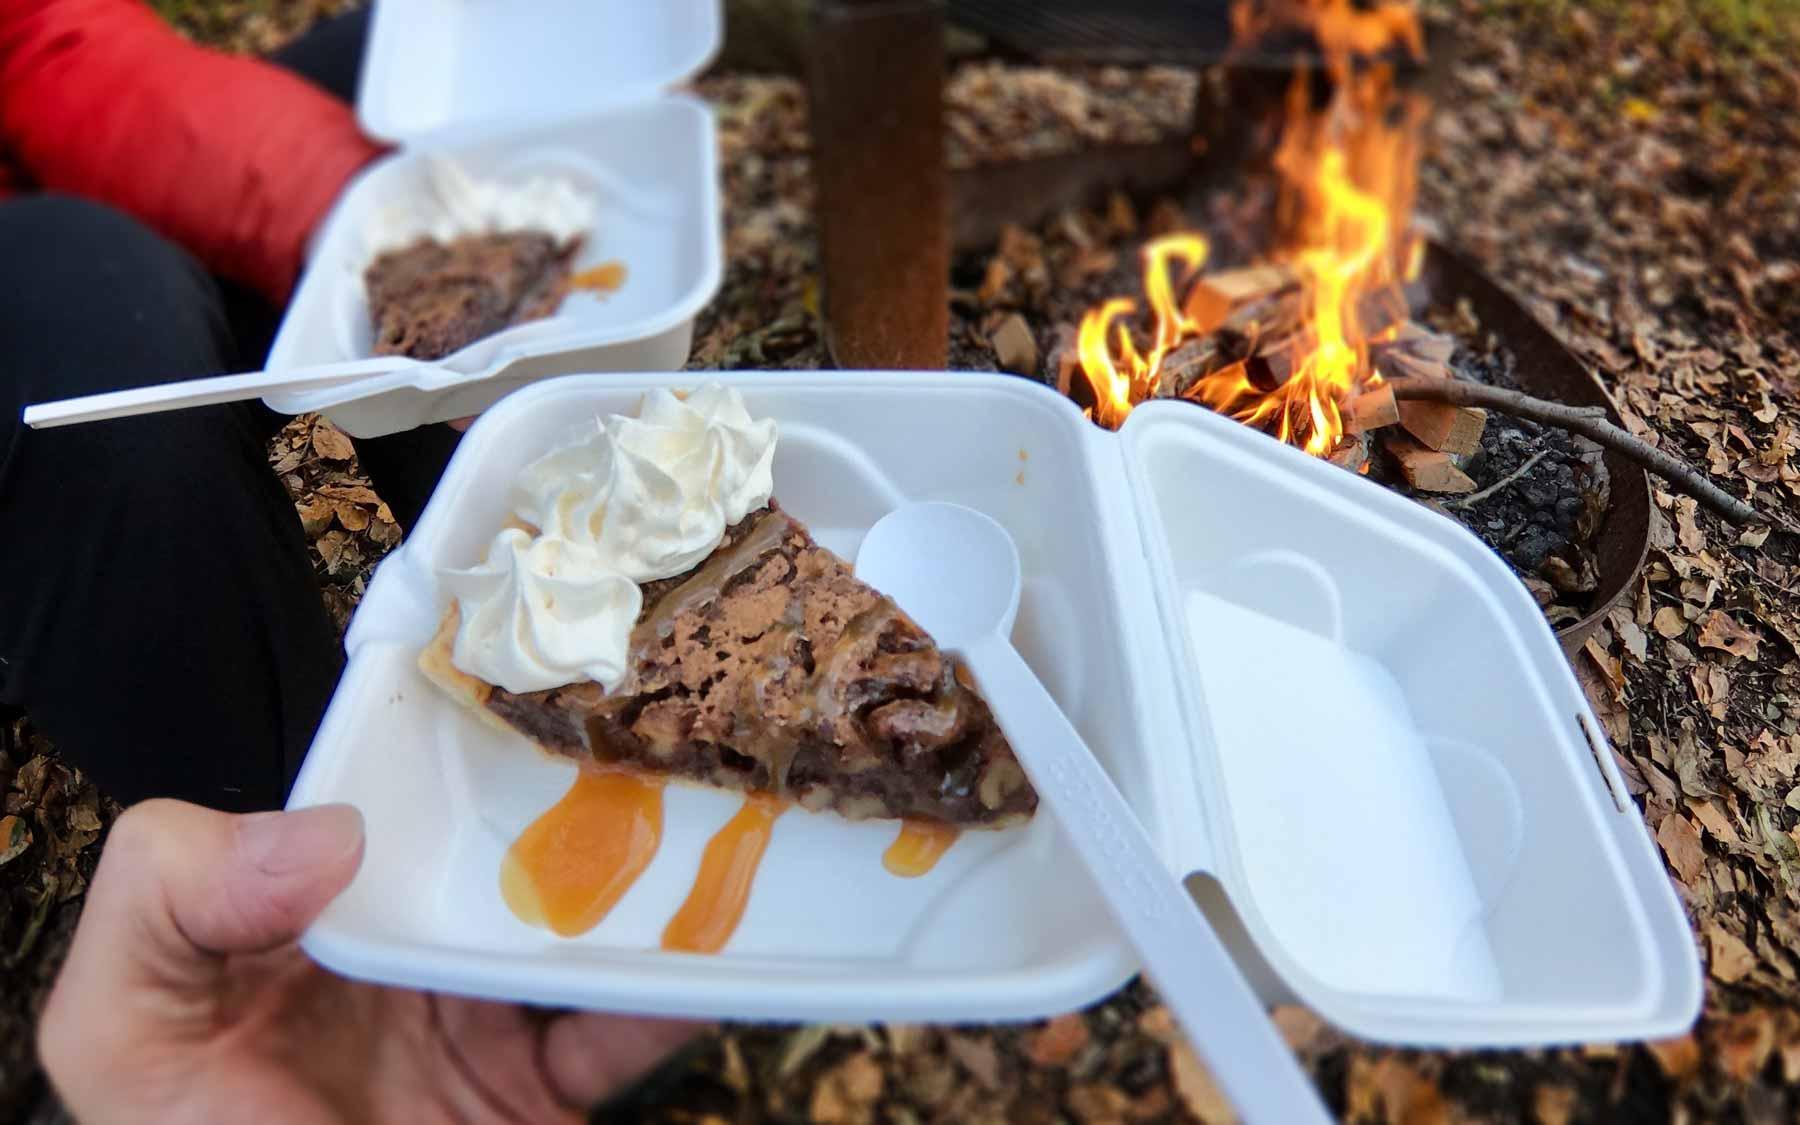 Bourbon-cream chocolate chess pie from Peaks of Otter Lodge, off Blue Ridge Parkway, Virginia